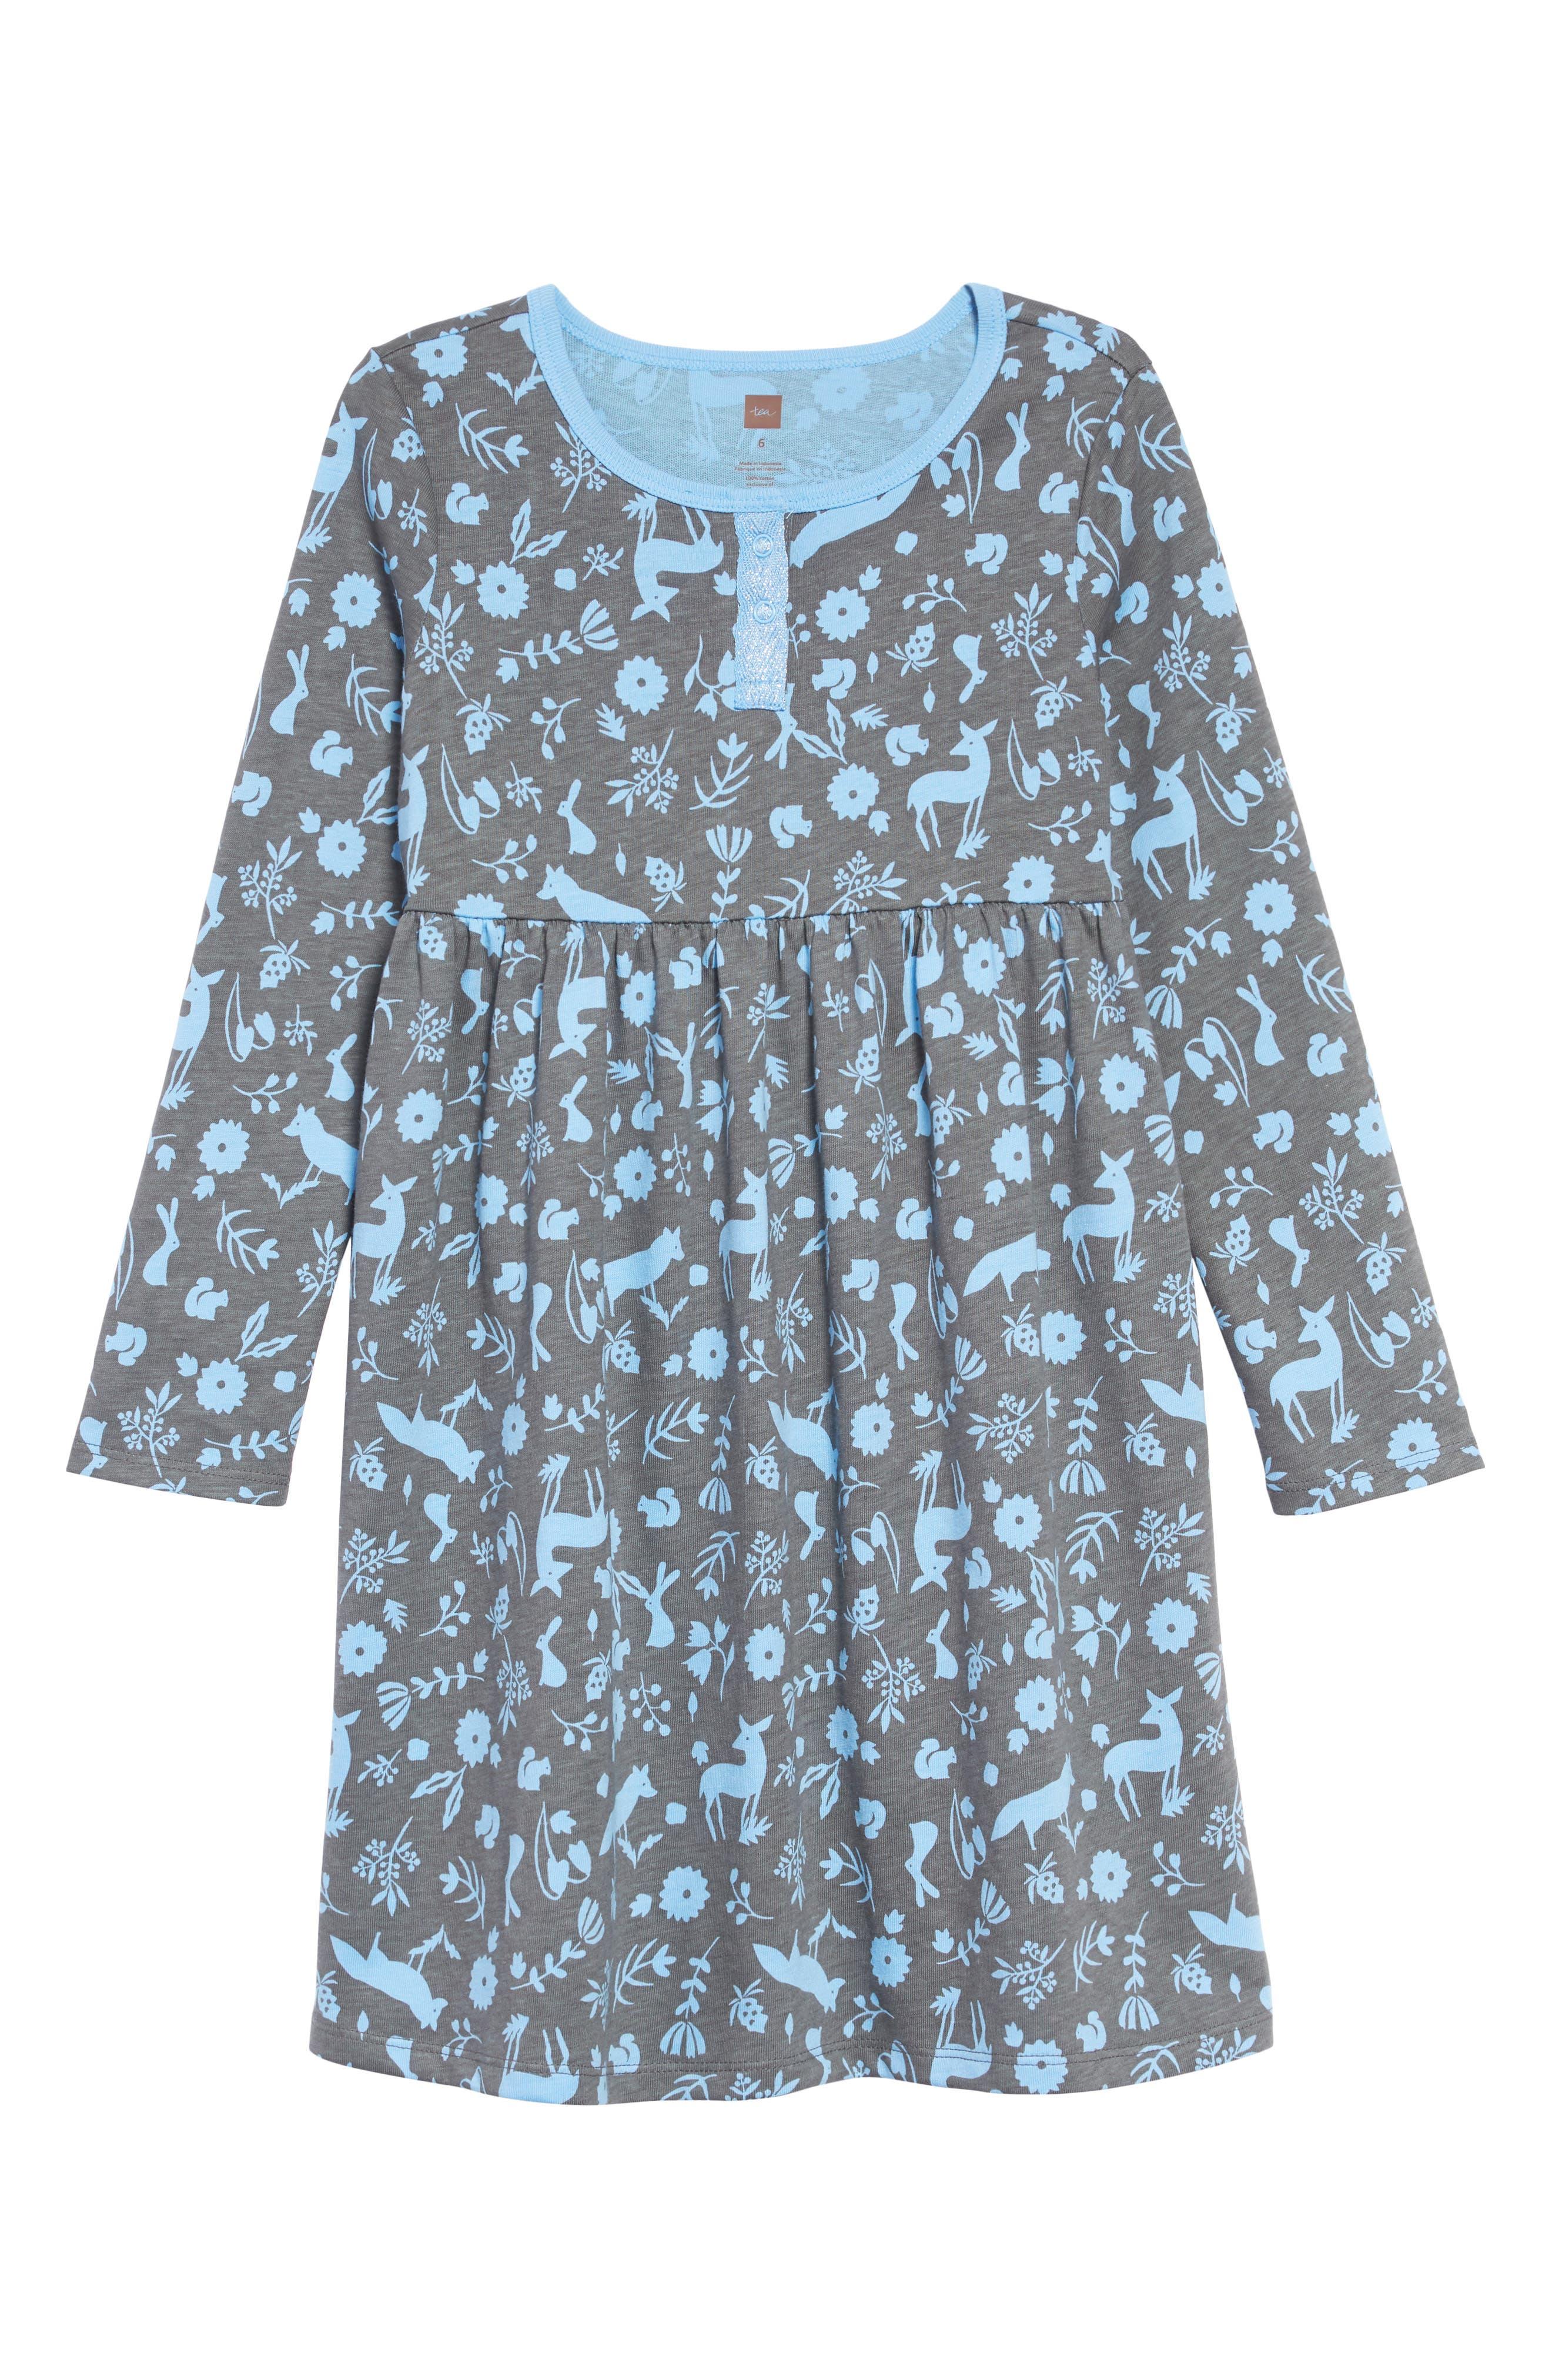 Sparkle Henley Dress,                             Main thumbnail 1, color,                             DESERT FLORA AND FAUNA